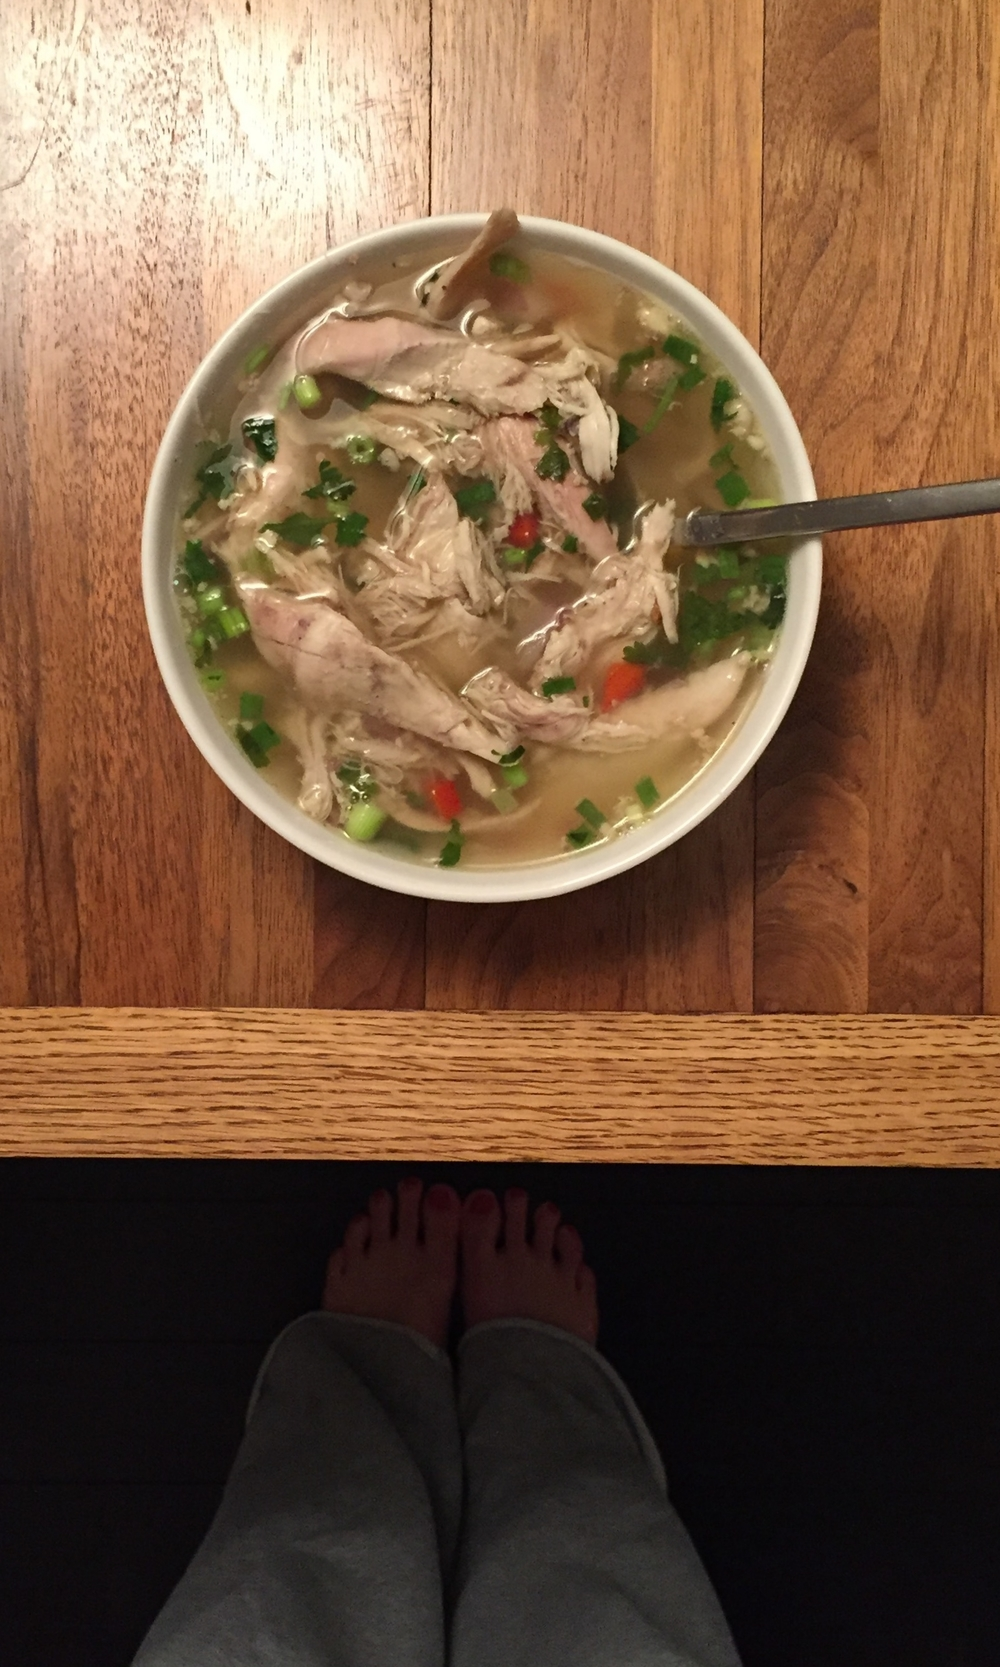 LaurenSchwaiger-Life-Style-Blog-Viva-Chicken-Chicken-Soup.jpg